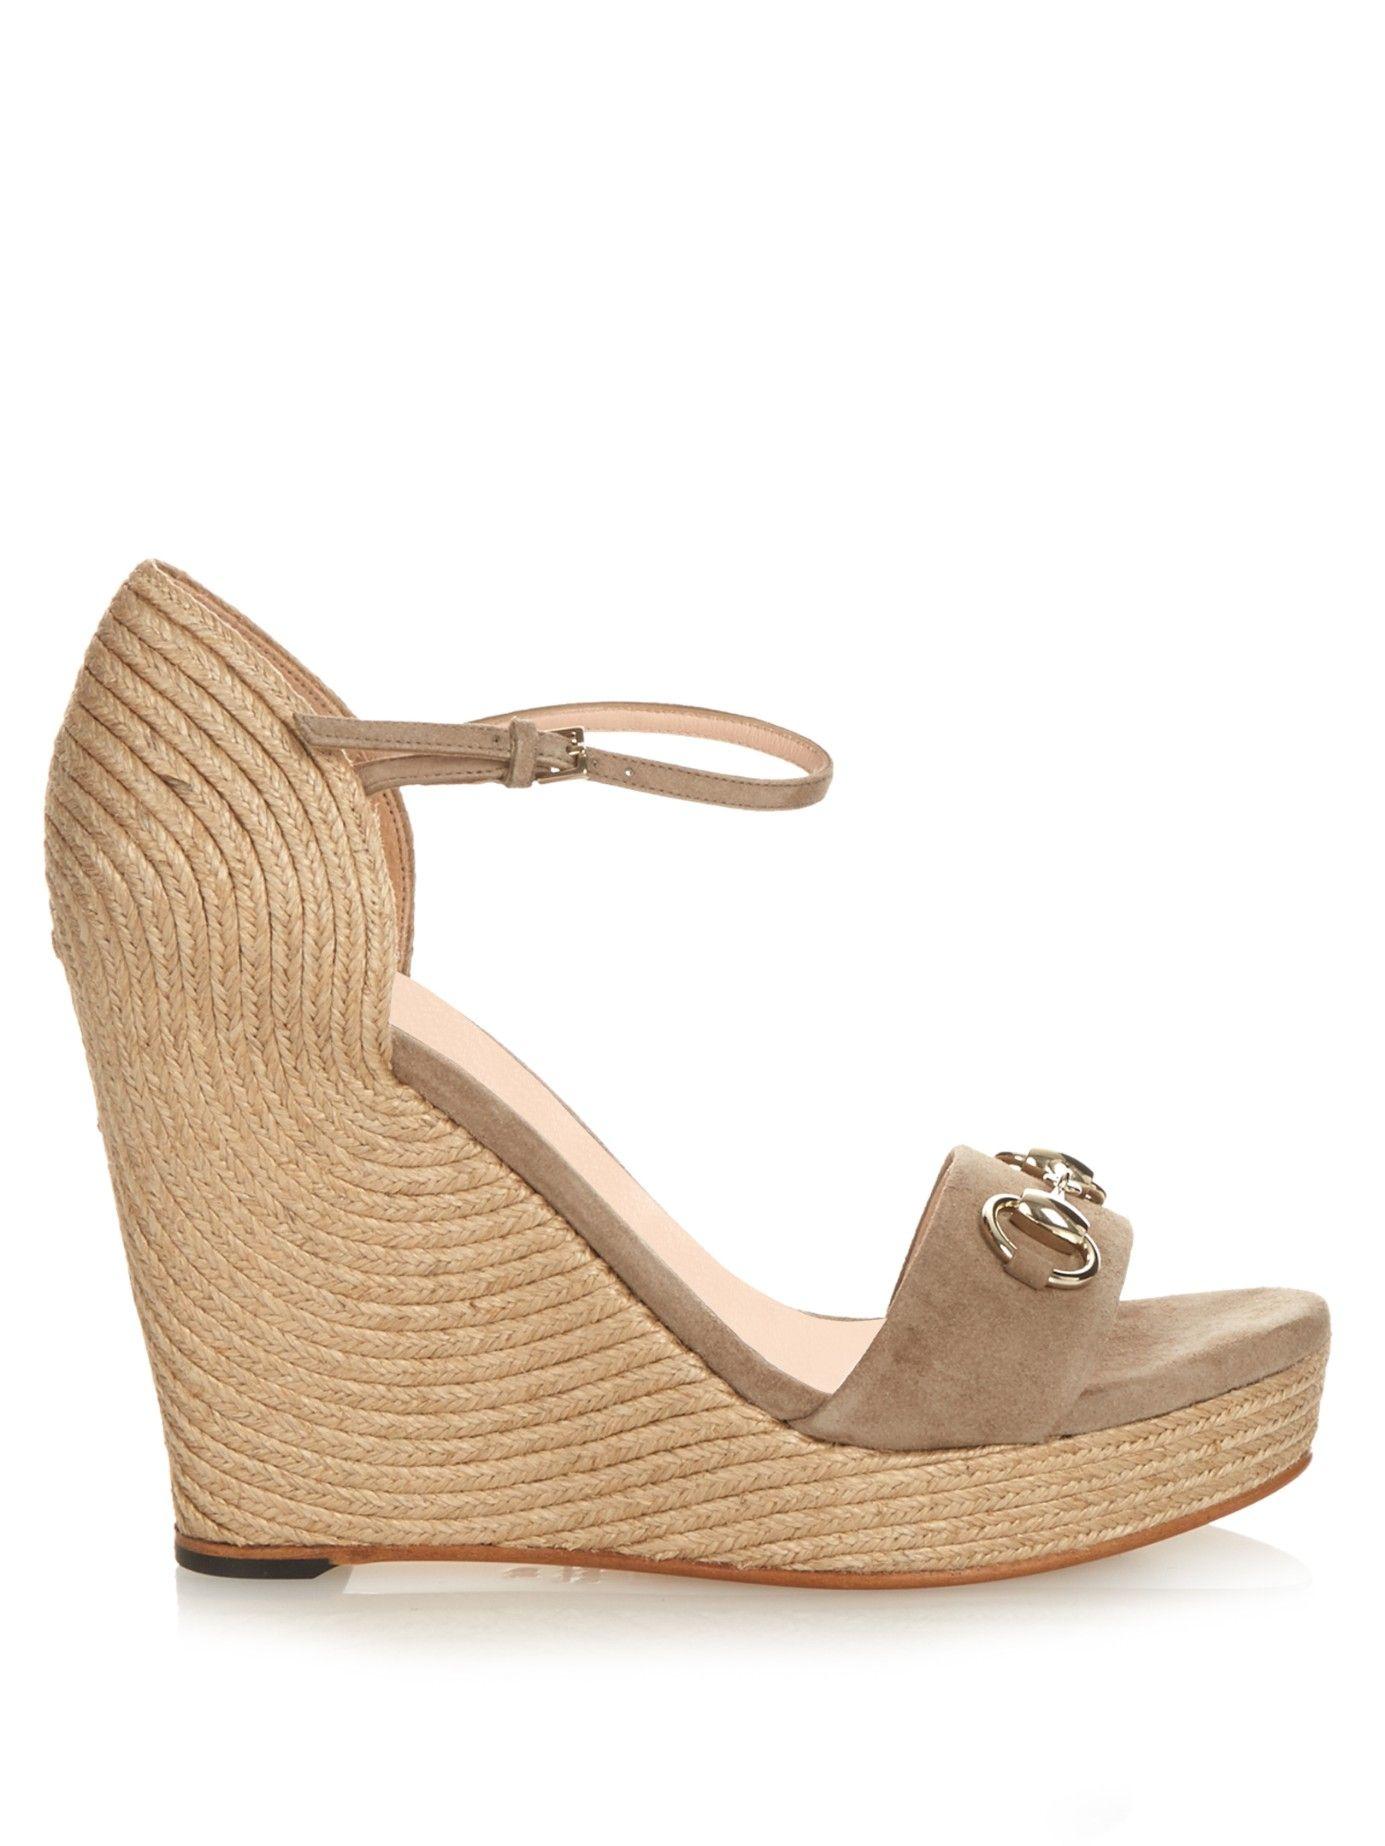 27953c553105 Carolina horsebit suede wedge sandals